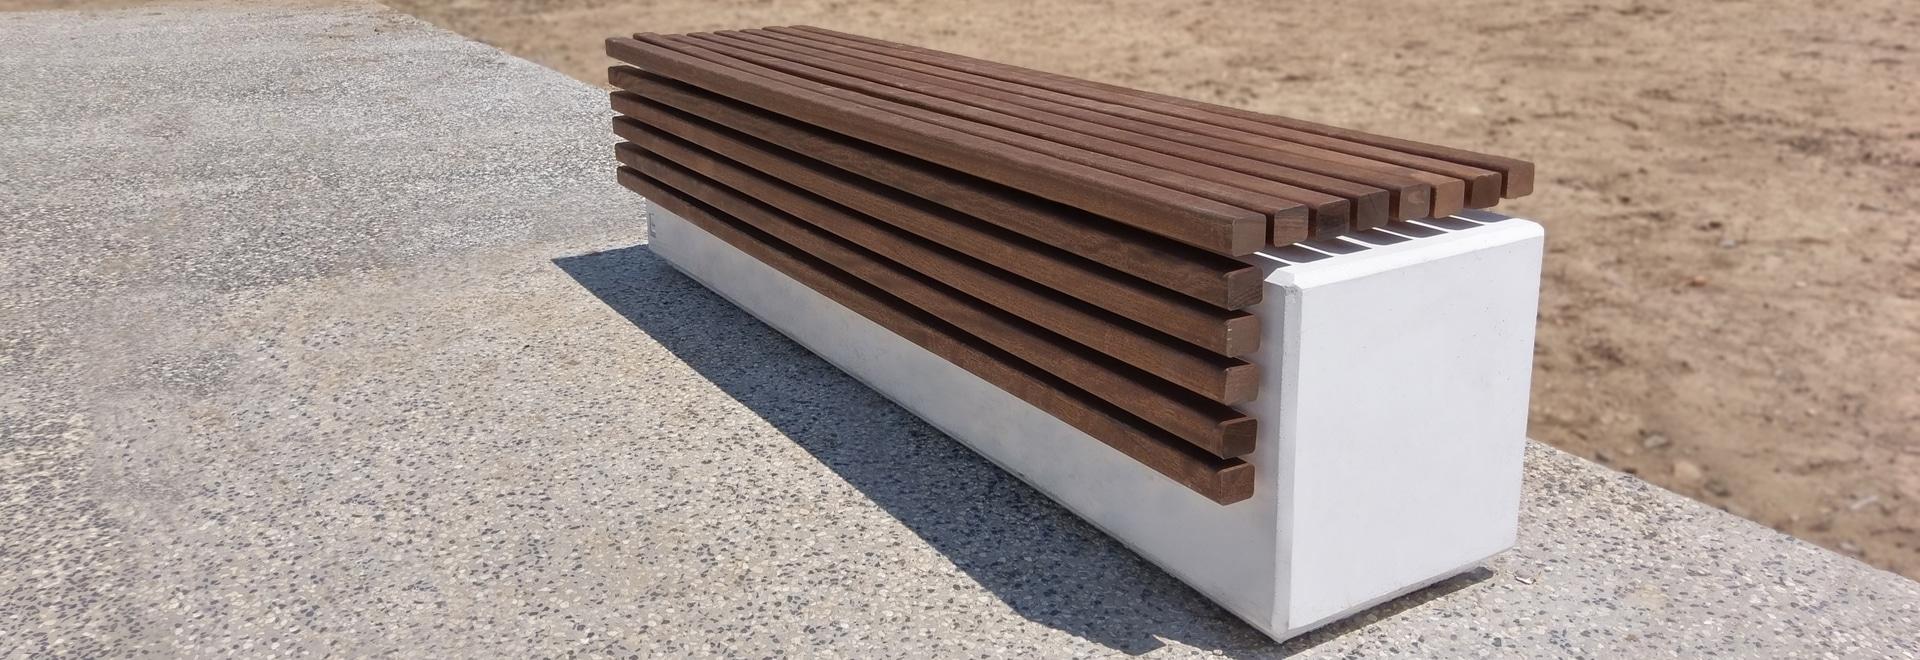 Lithos wood